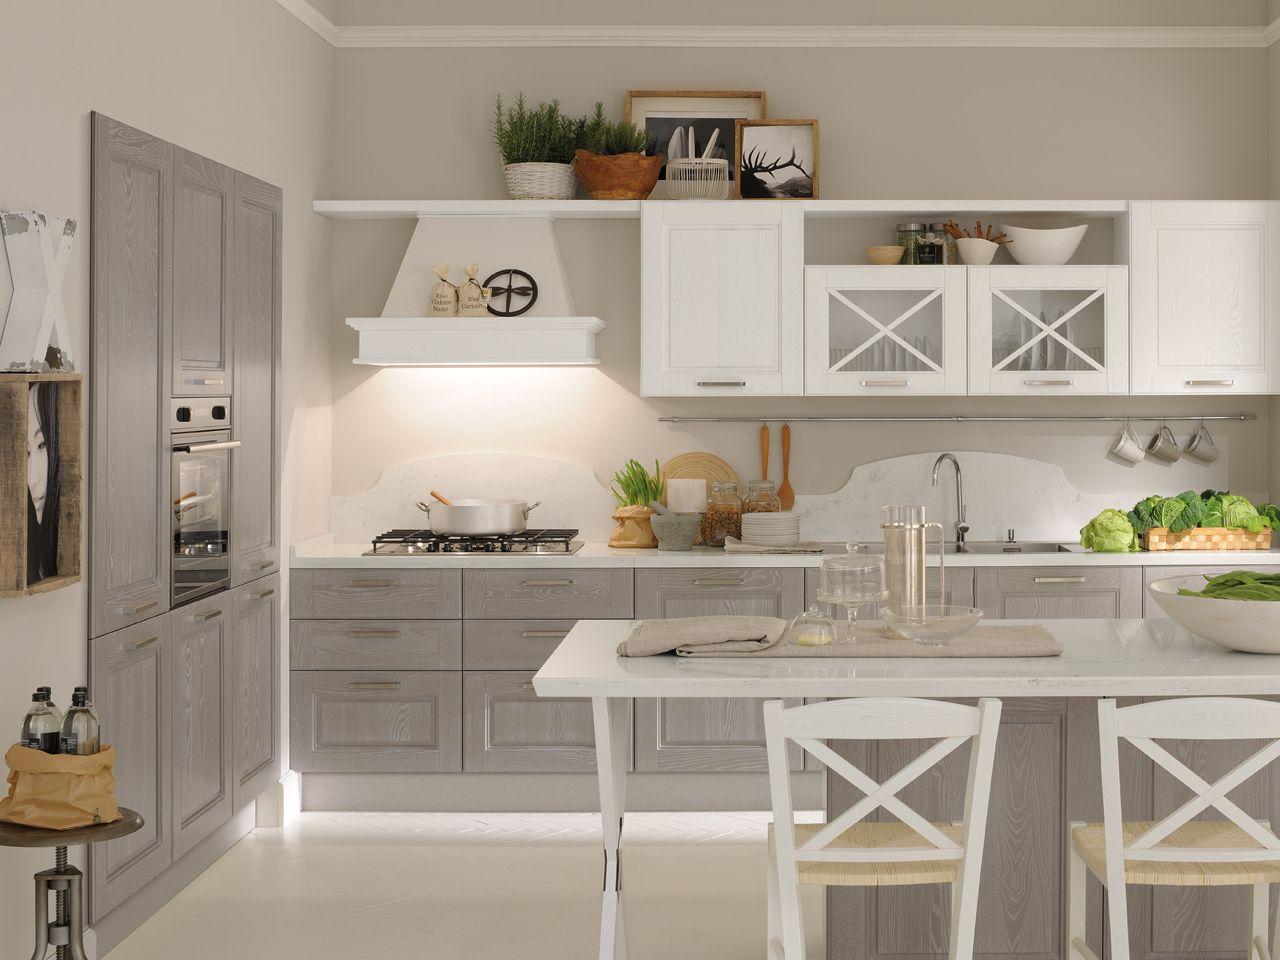 Agnese cucina lube classica cucine ricordi e amici for Arredo ingross 3